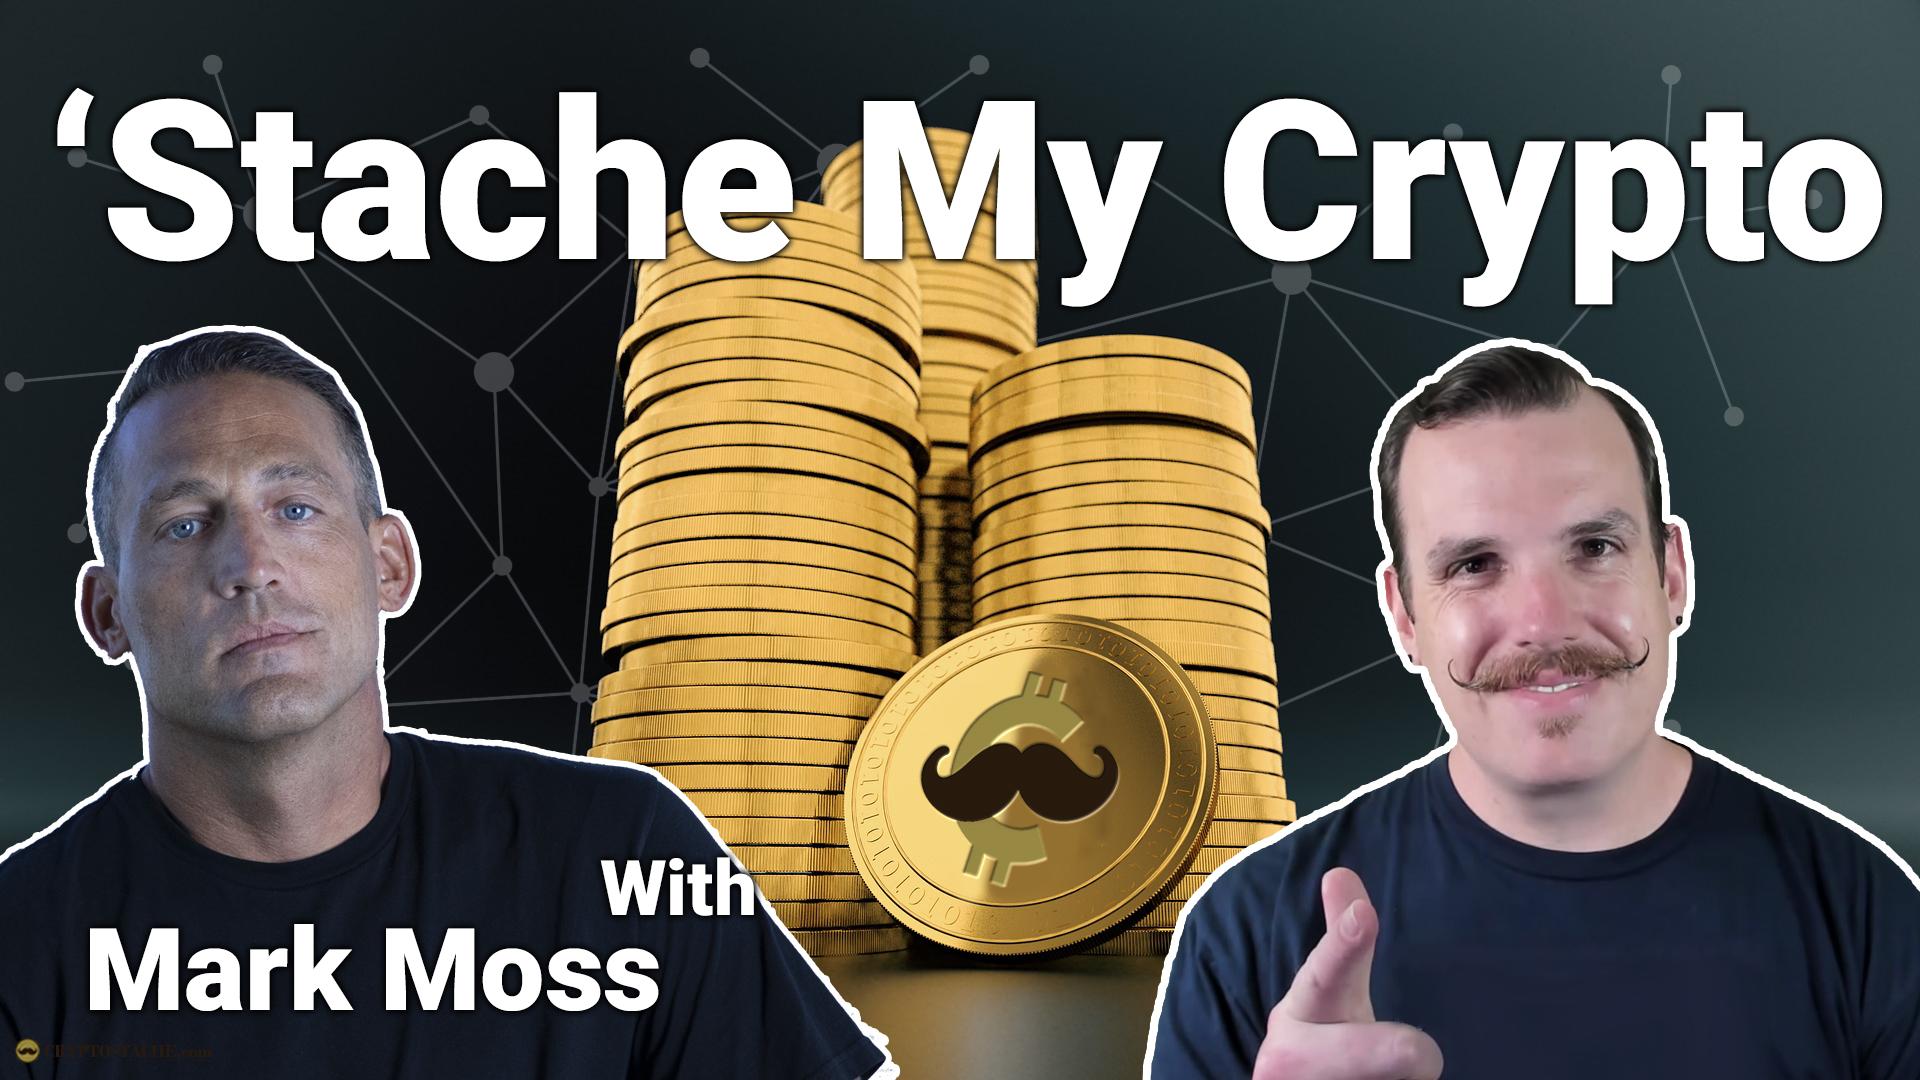 'Stache My Crypto livestream with Mark Moss